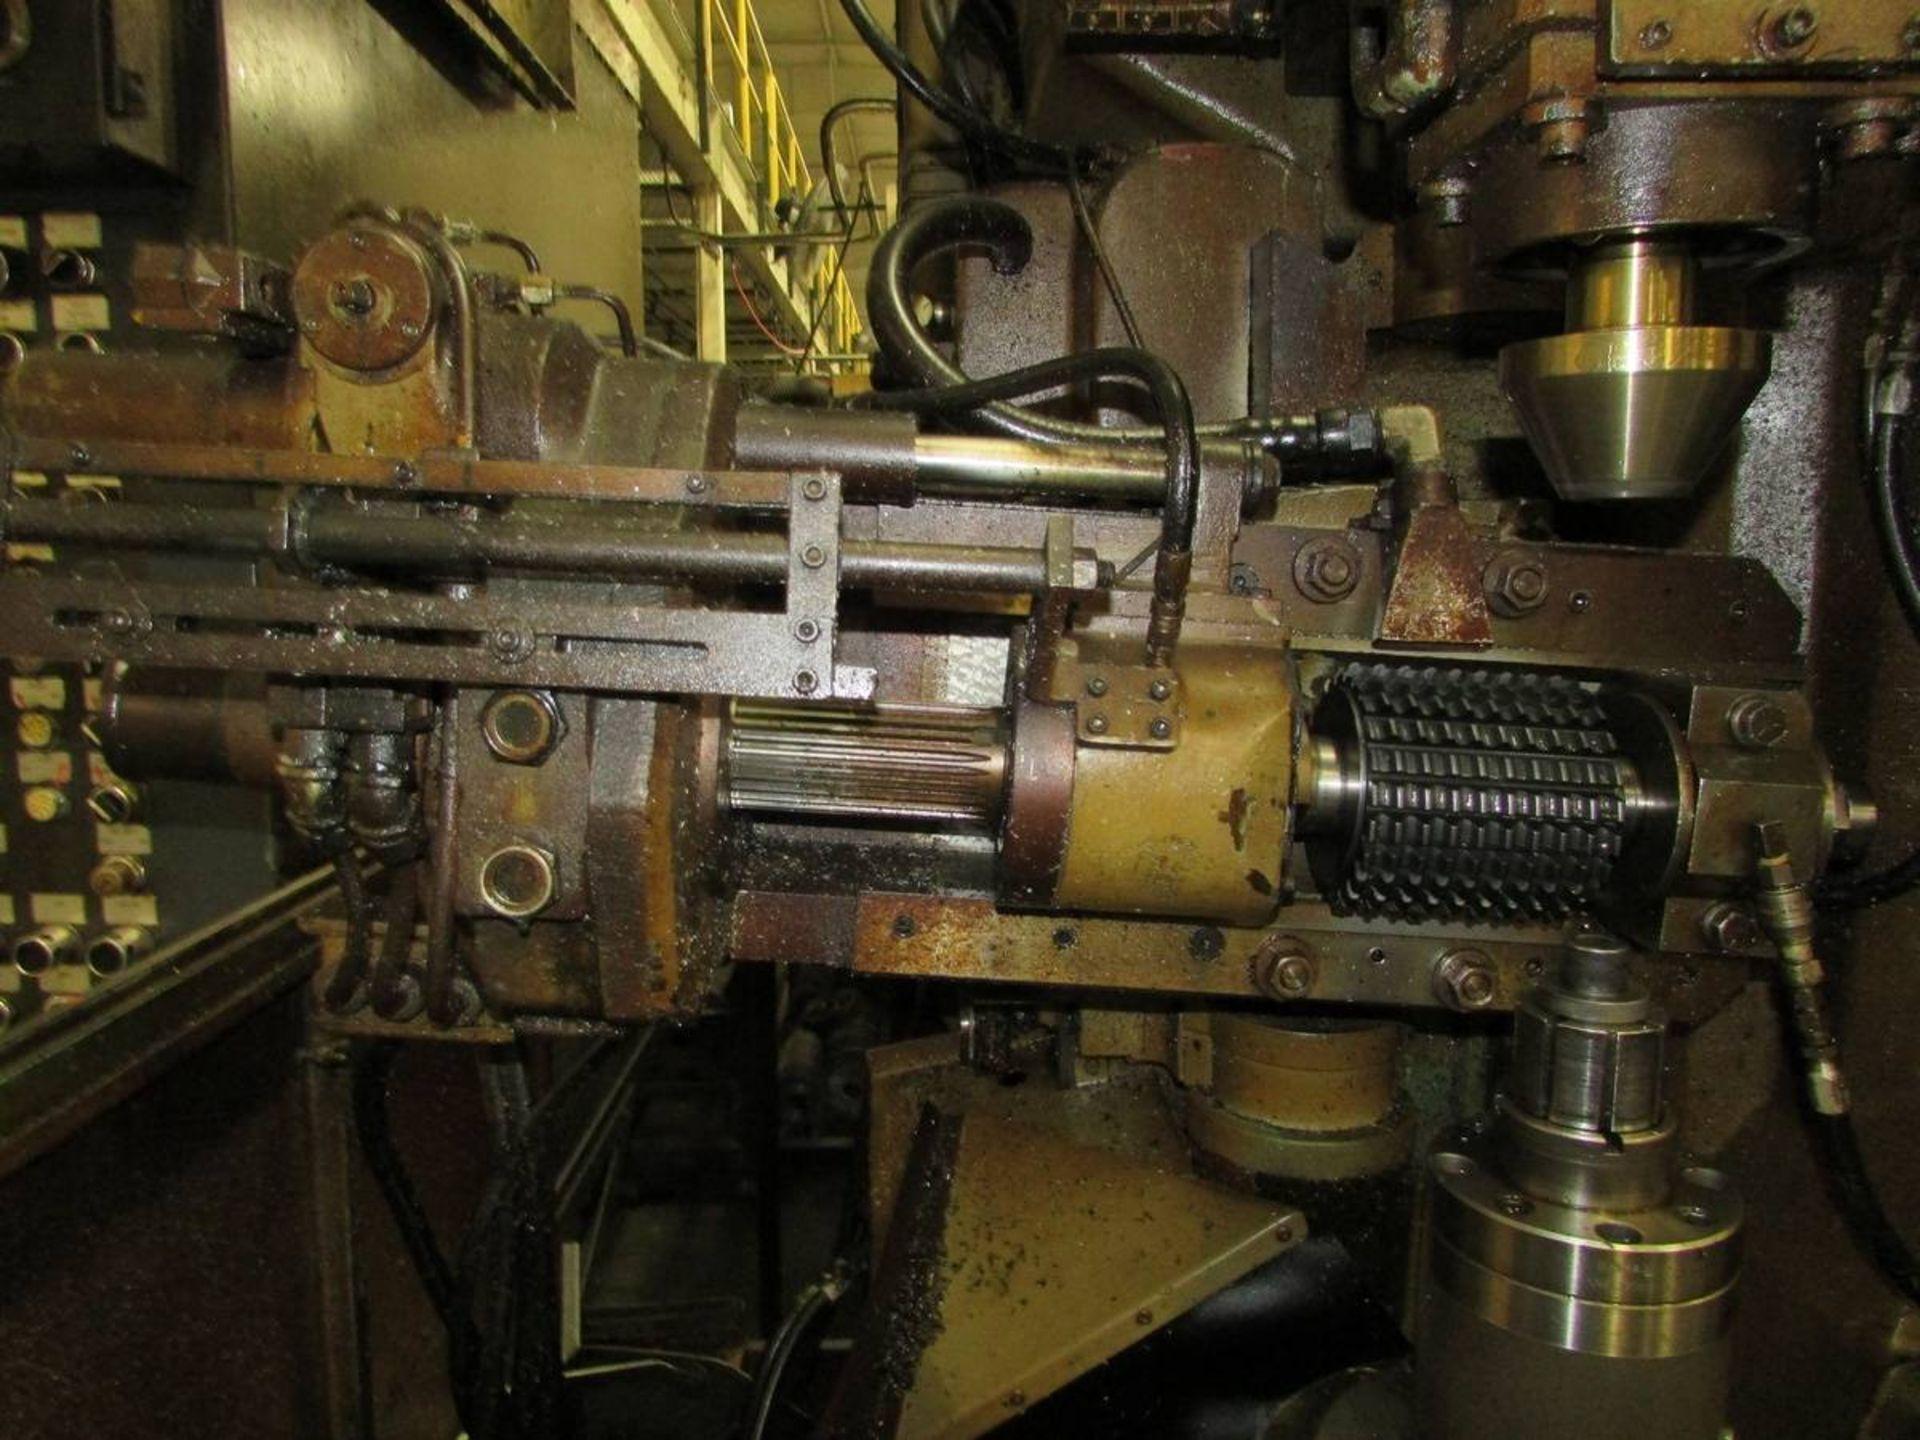 Cleveland/ Waterbury Farrel CR300-612-002 Universal CNC Gear Hobbing Machine - Image 4 of 19